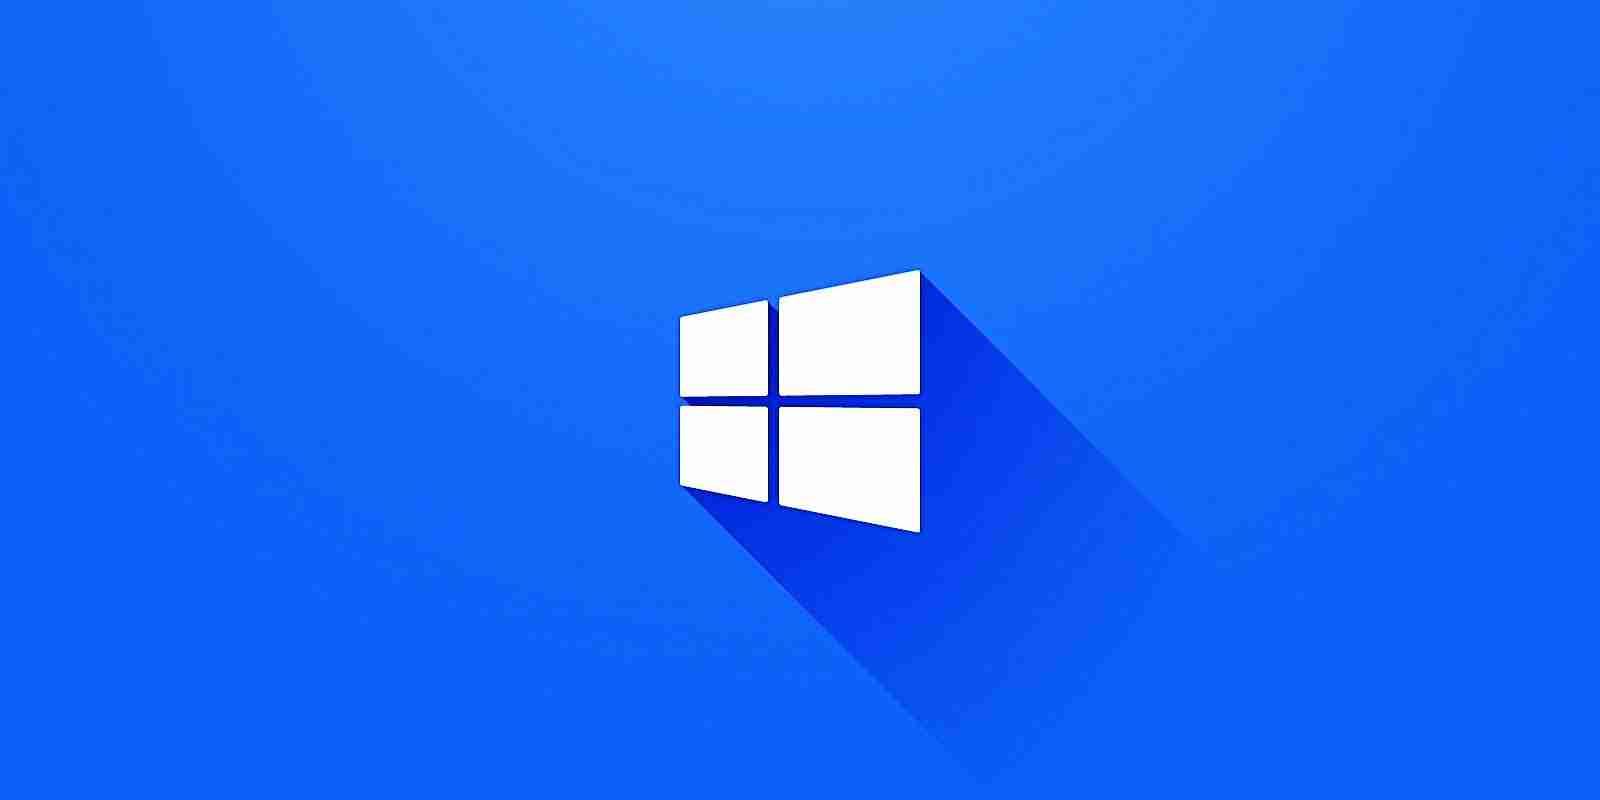 Microsoft Fixes Known Issue Blocking Windows 10 Upgrades